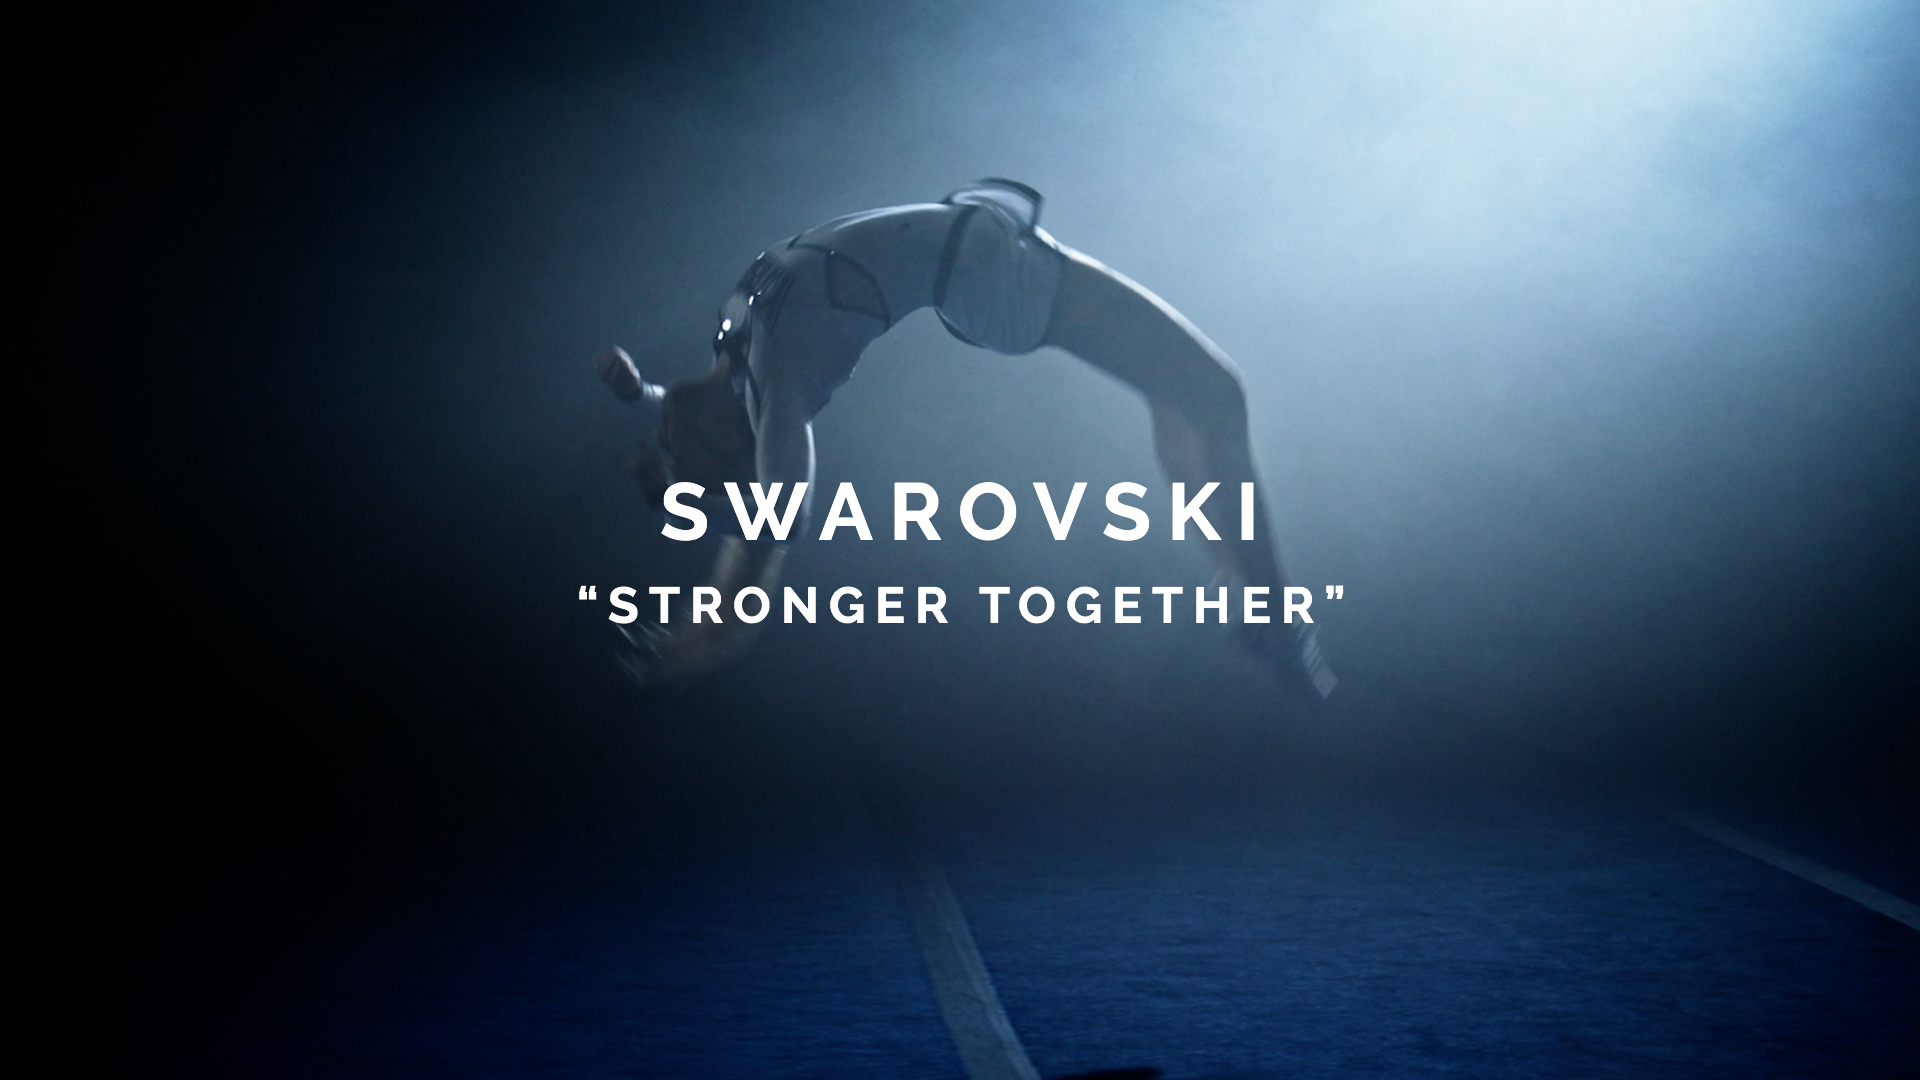 swarovski2_16_9.png